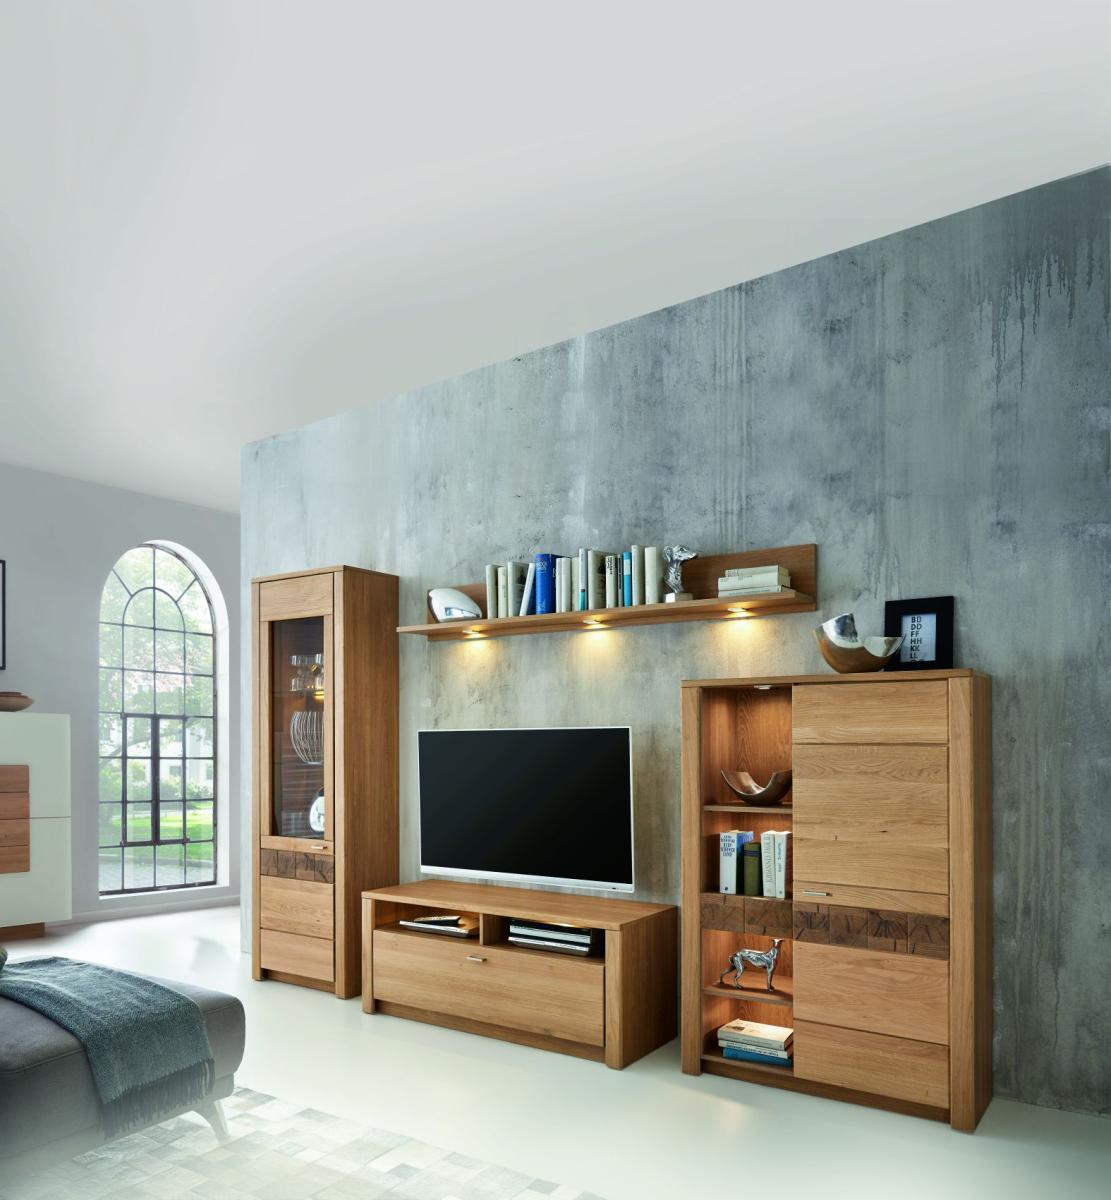 mobel hermes mobel sofas kuchen betten esstische badschranke heiligenroth. Black Bedroom Furniture Sets. Home Design Ideas